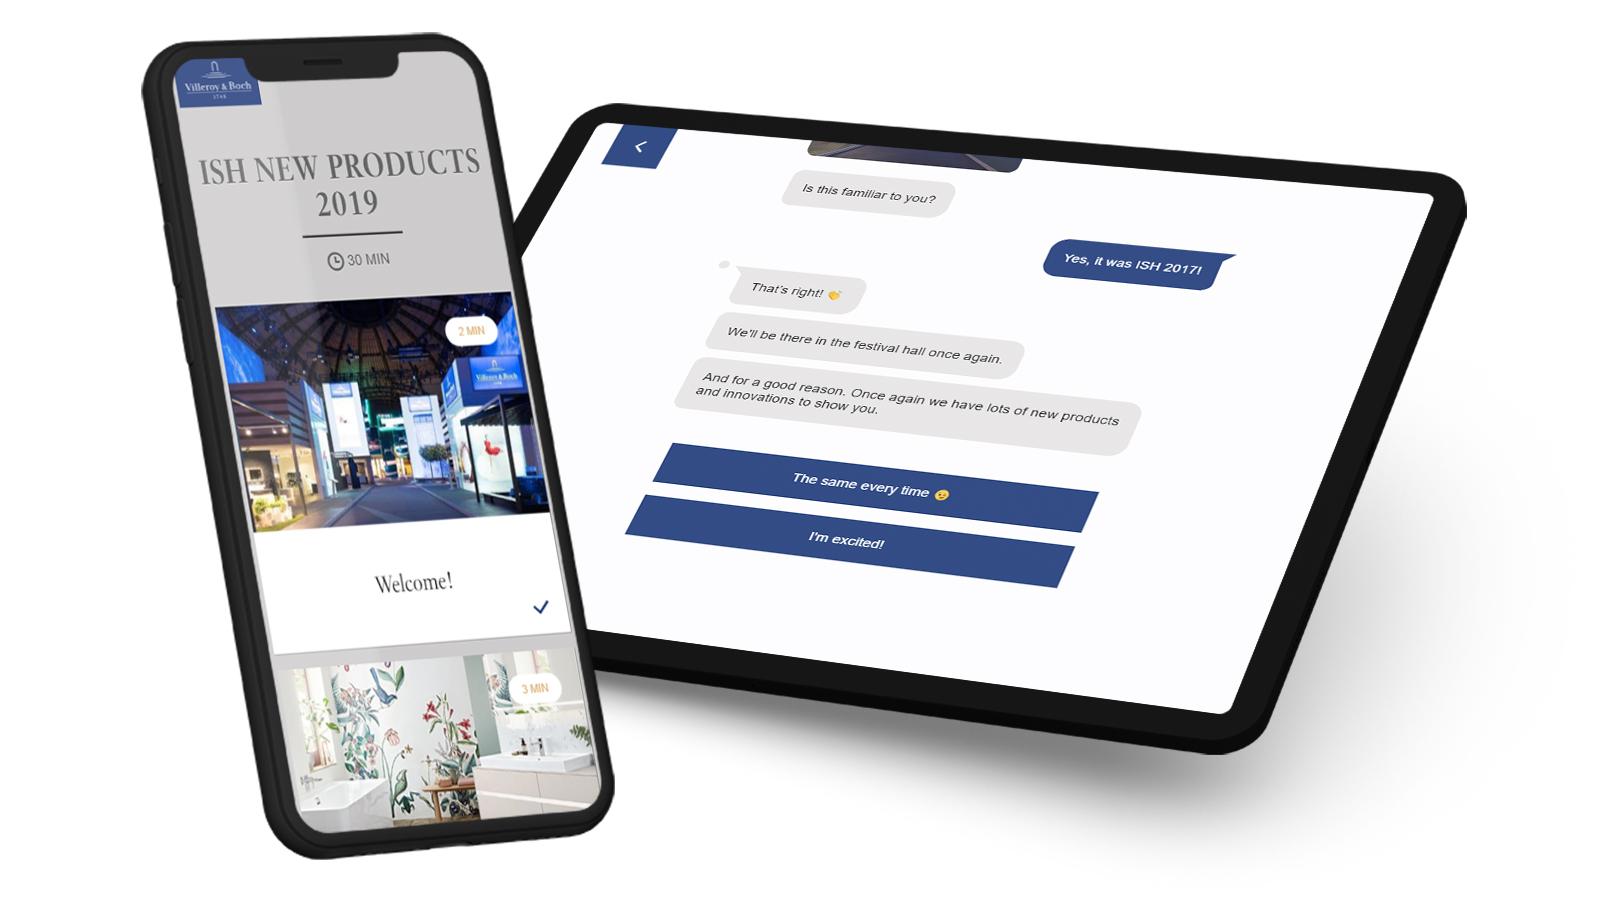 case study chatbot web based training kundenreferenz villeroy boch